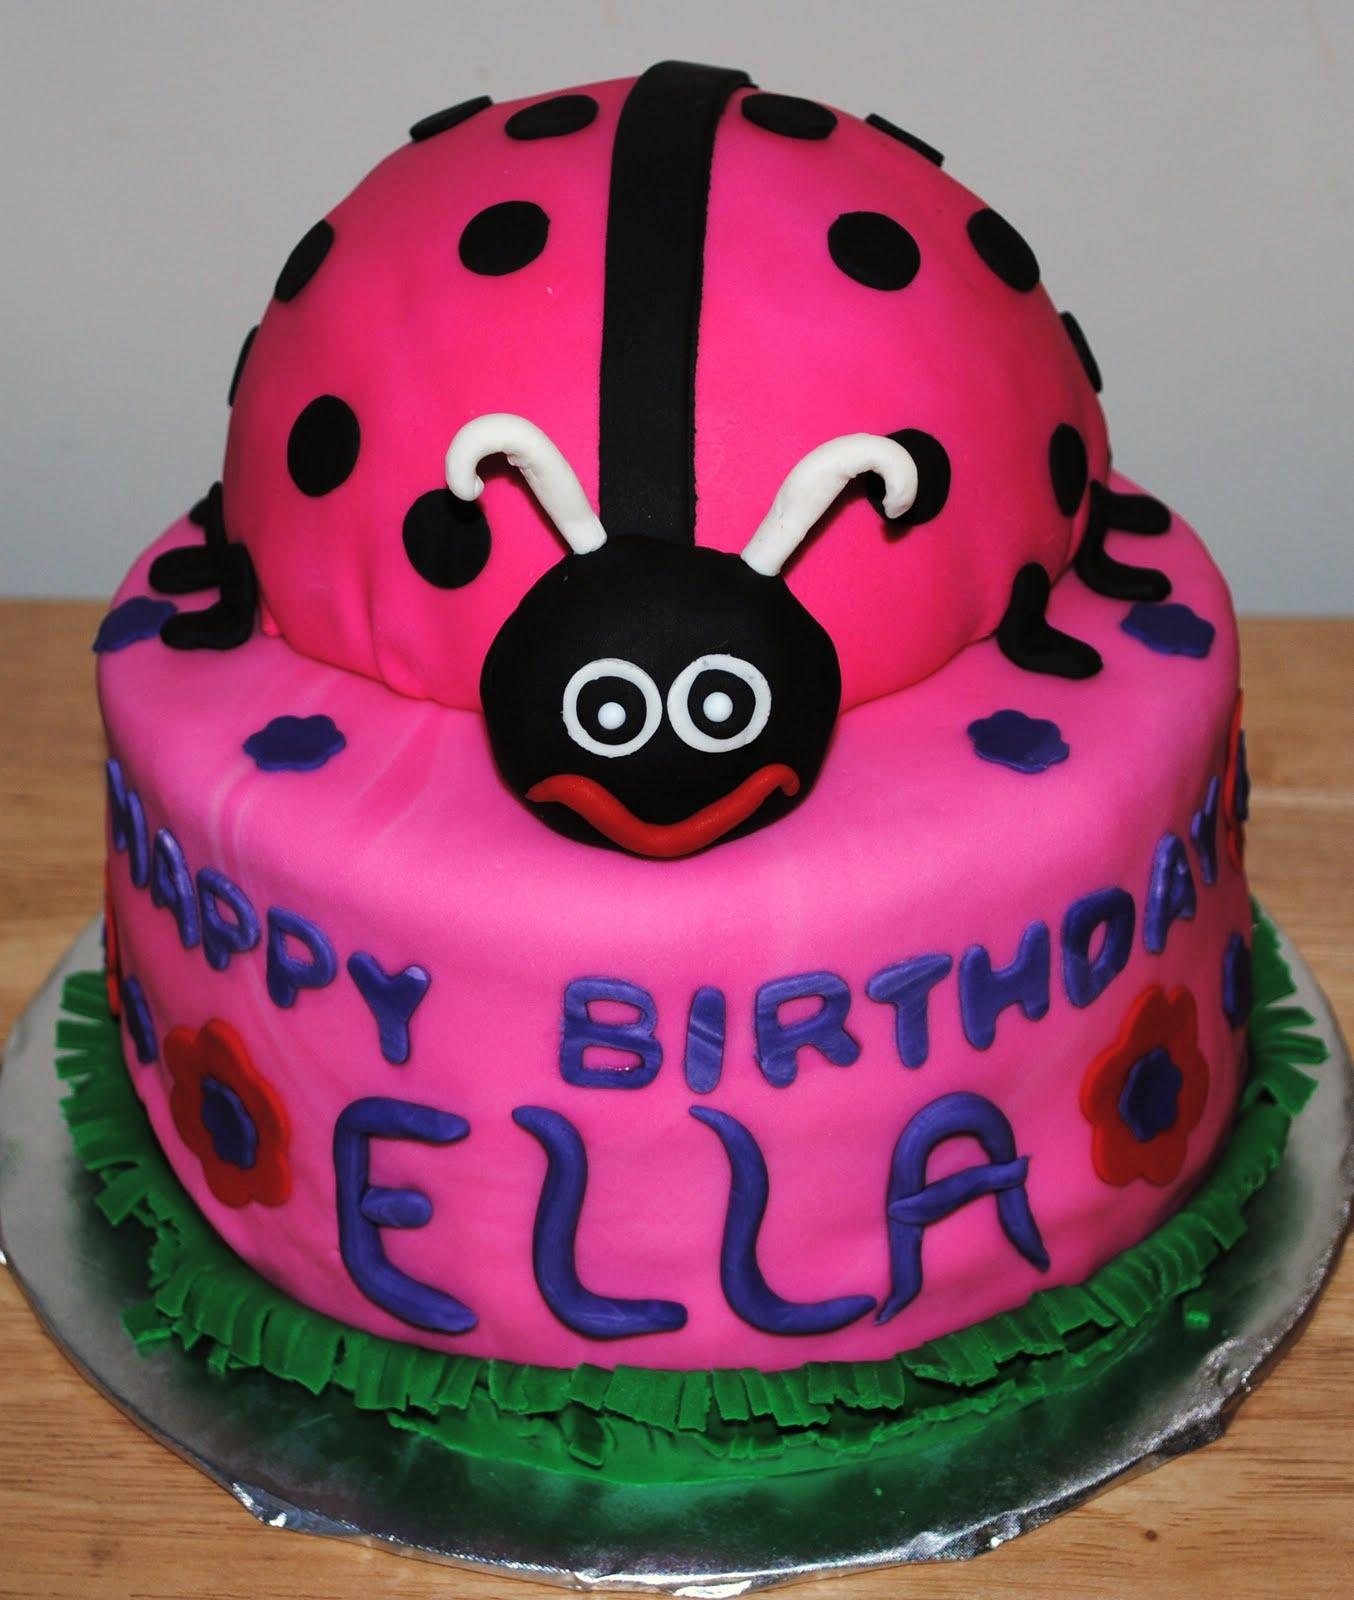 Birthday Party Supplies South Edmonton Image Inspiration of Cake